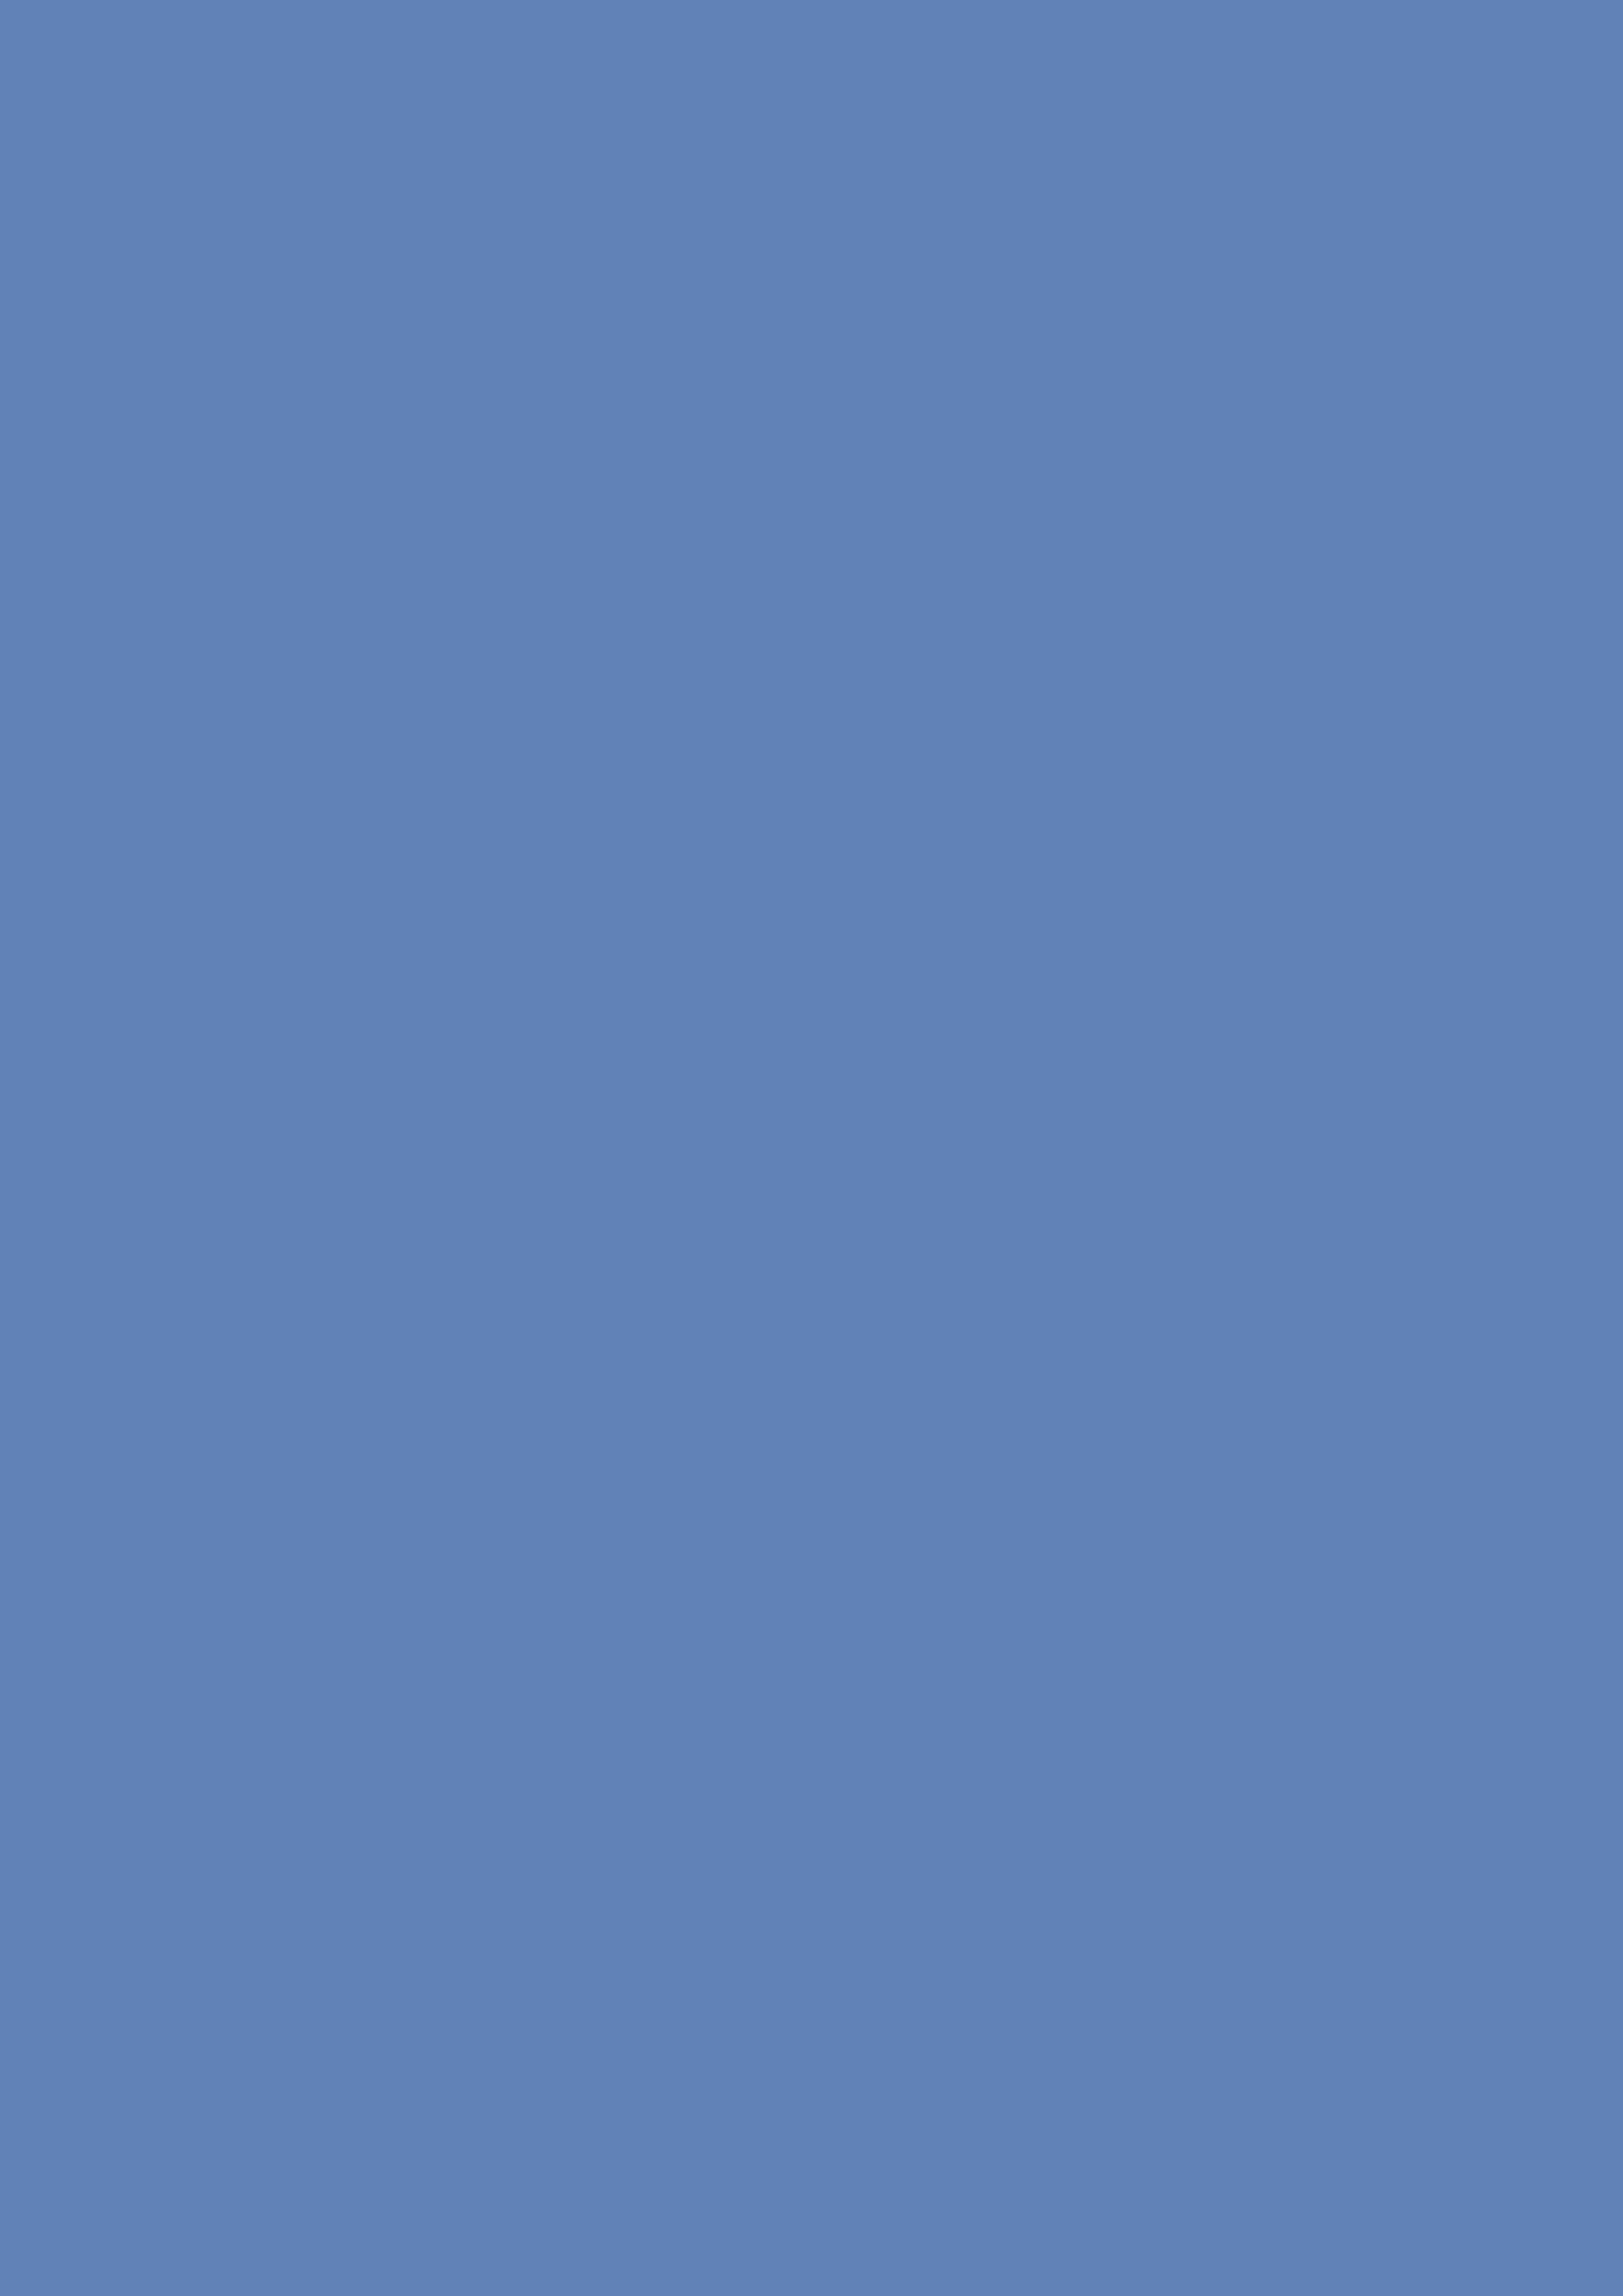 2480x3508 Glaucous Solid Color Background